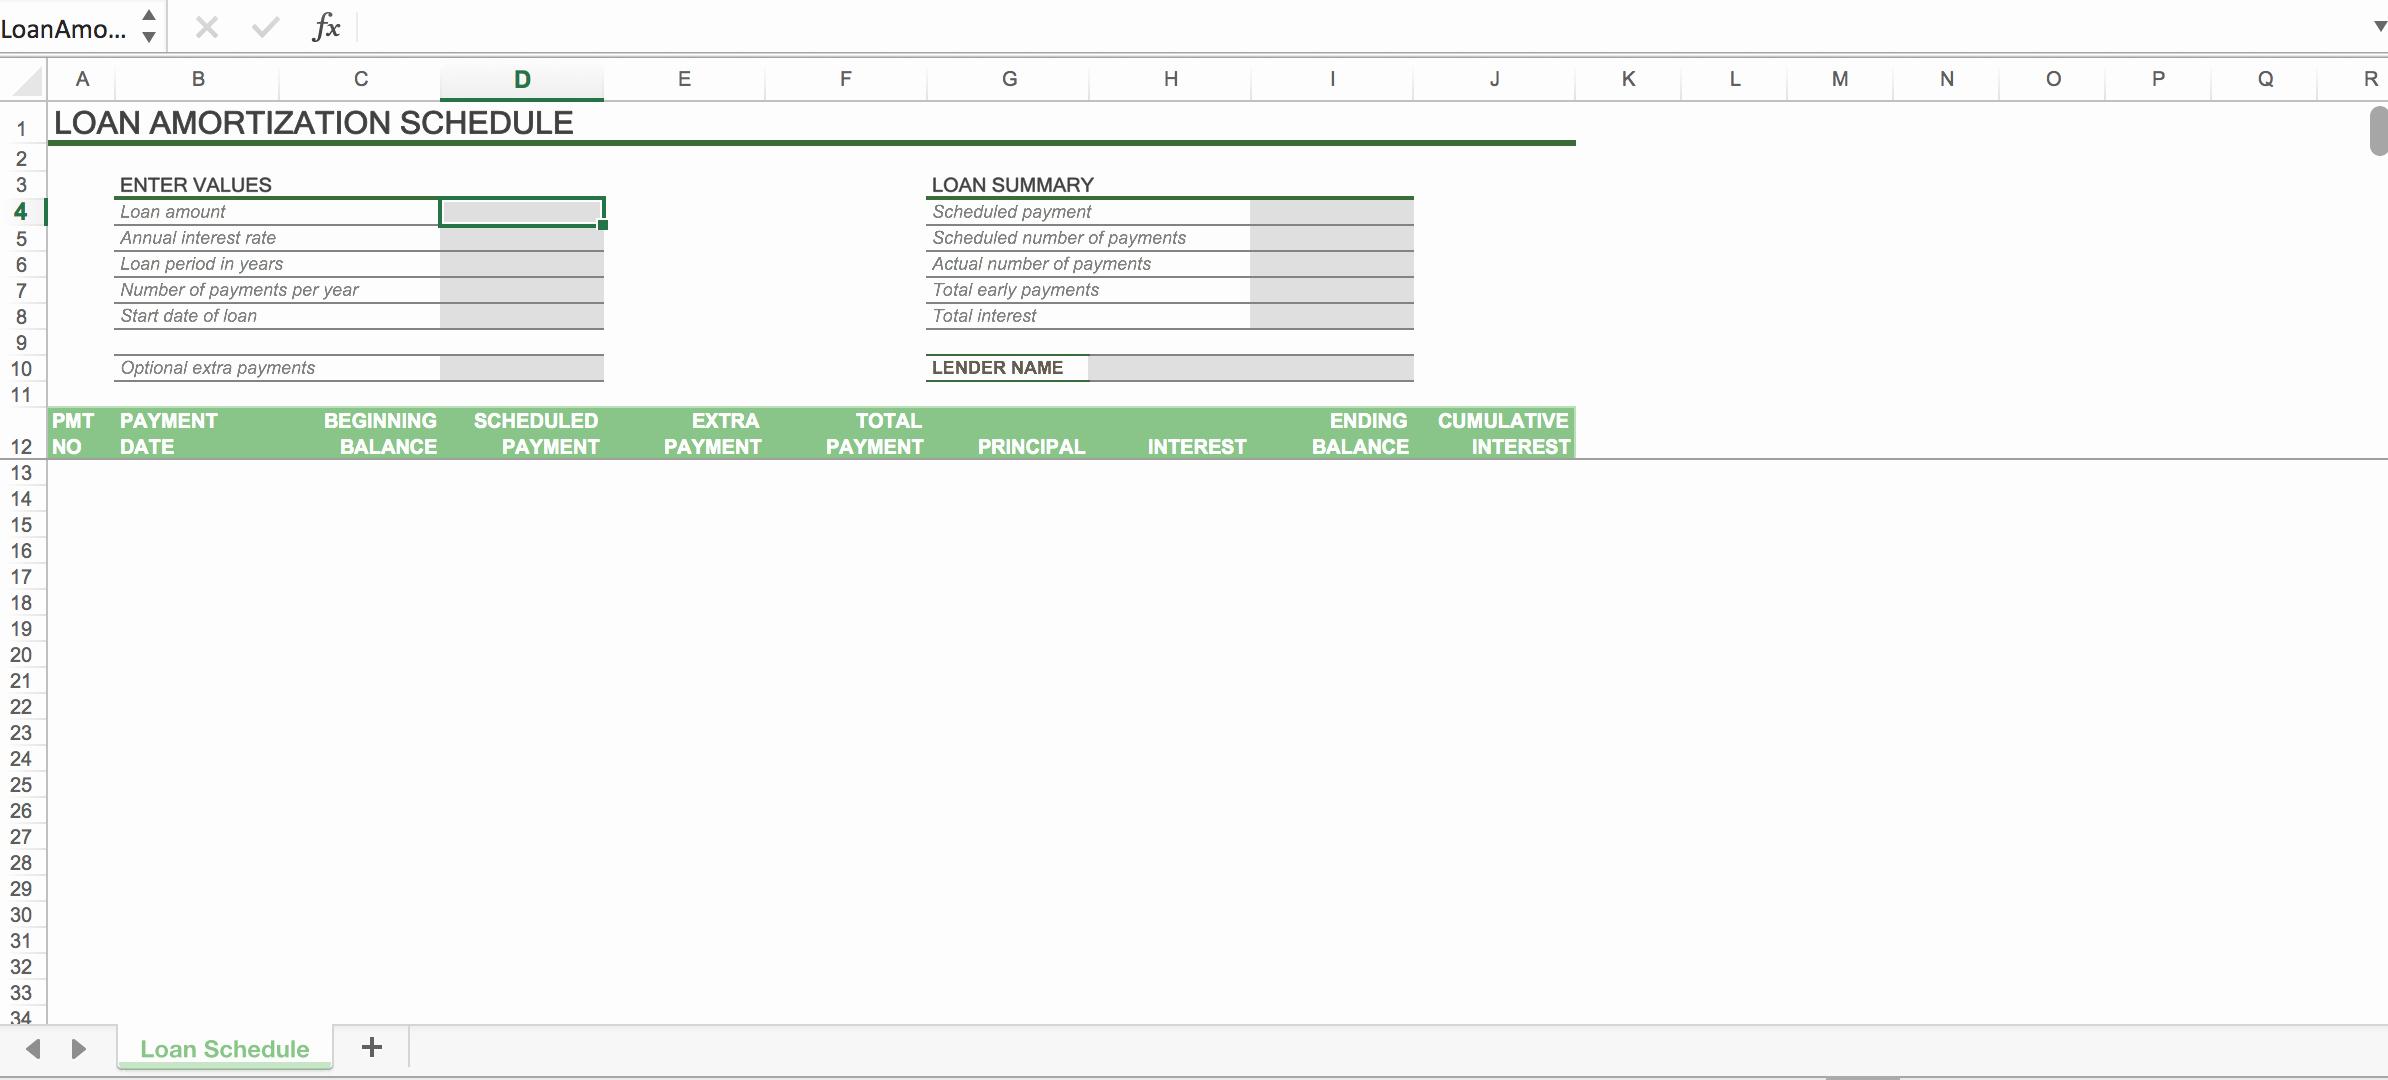 Car Amortization Schedule Excel New Car Loan Amortization Schedule Excel with Extra Payments